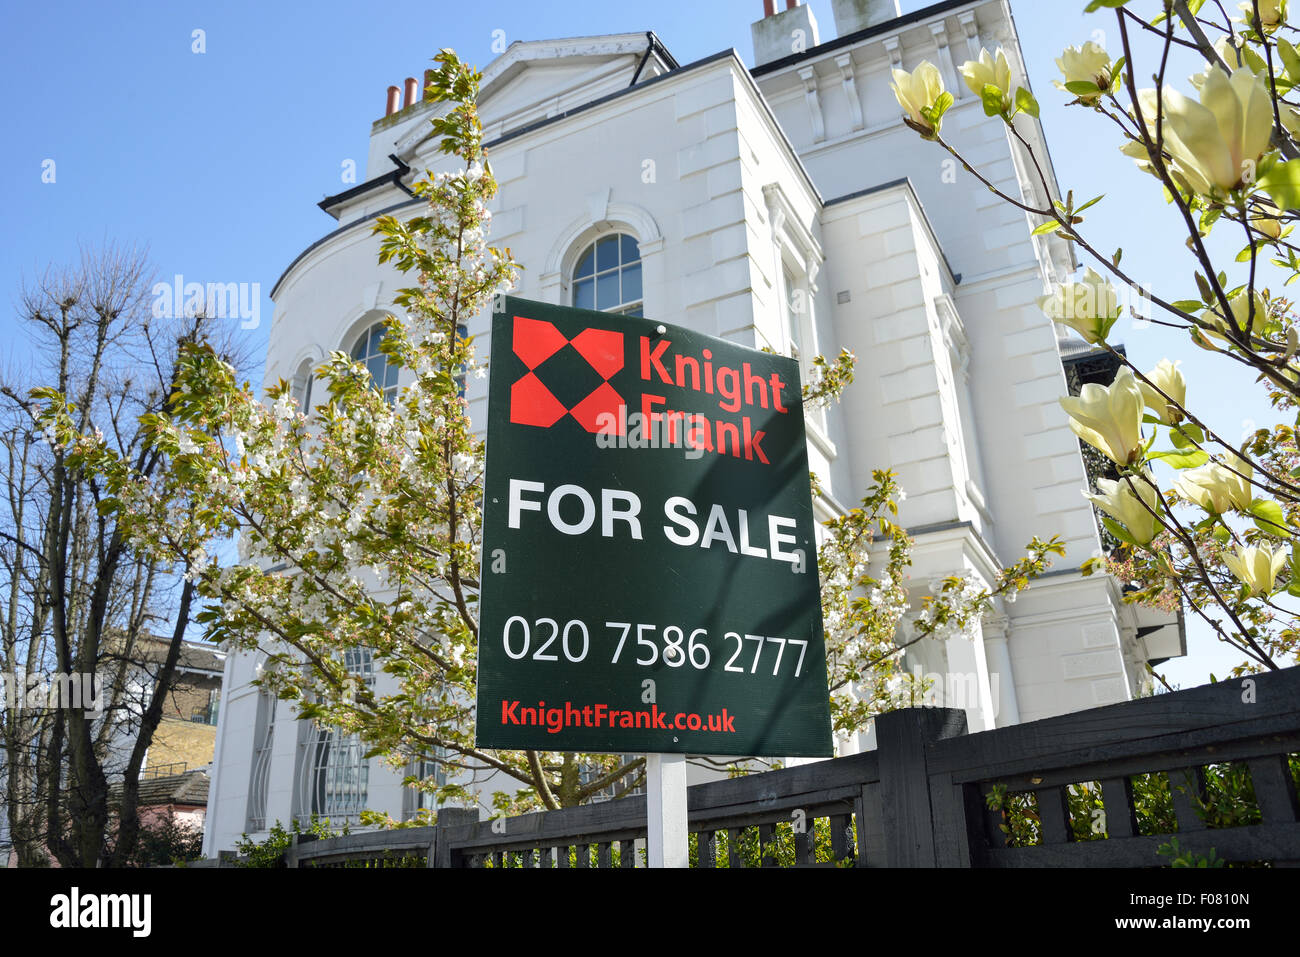 For Sale sign, Albert Terrace, Primrose Hill, London Borough of Camden, Greater London, England, United Kingdom - Stock Image